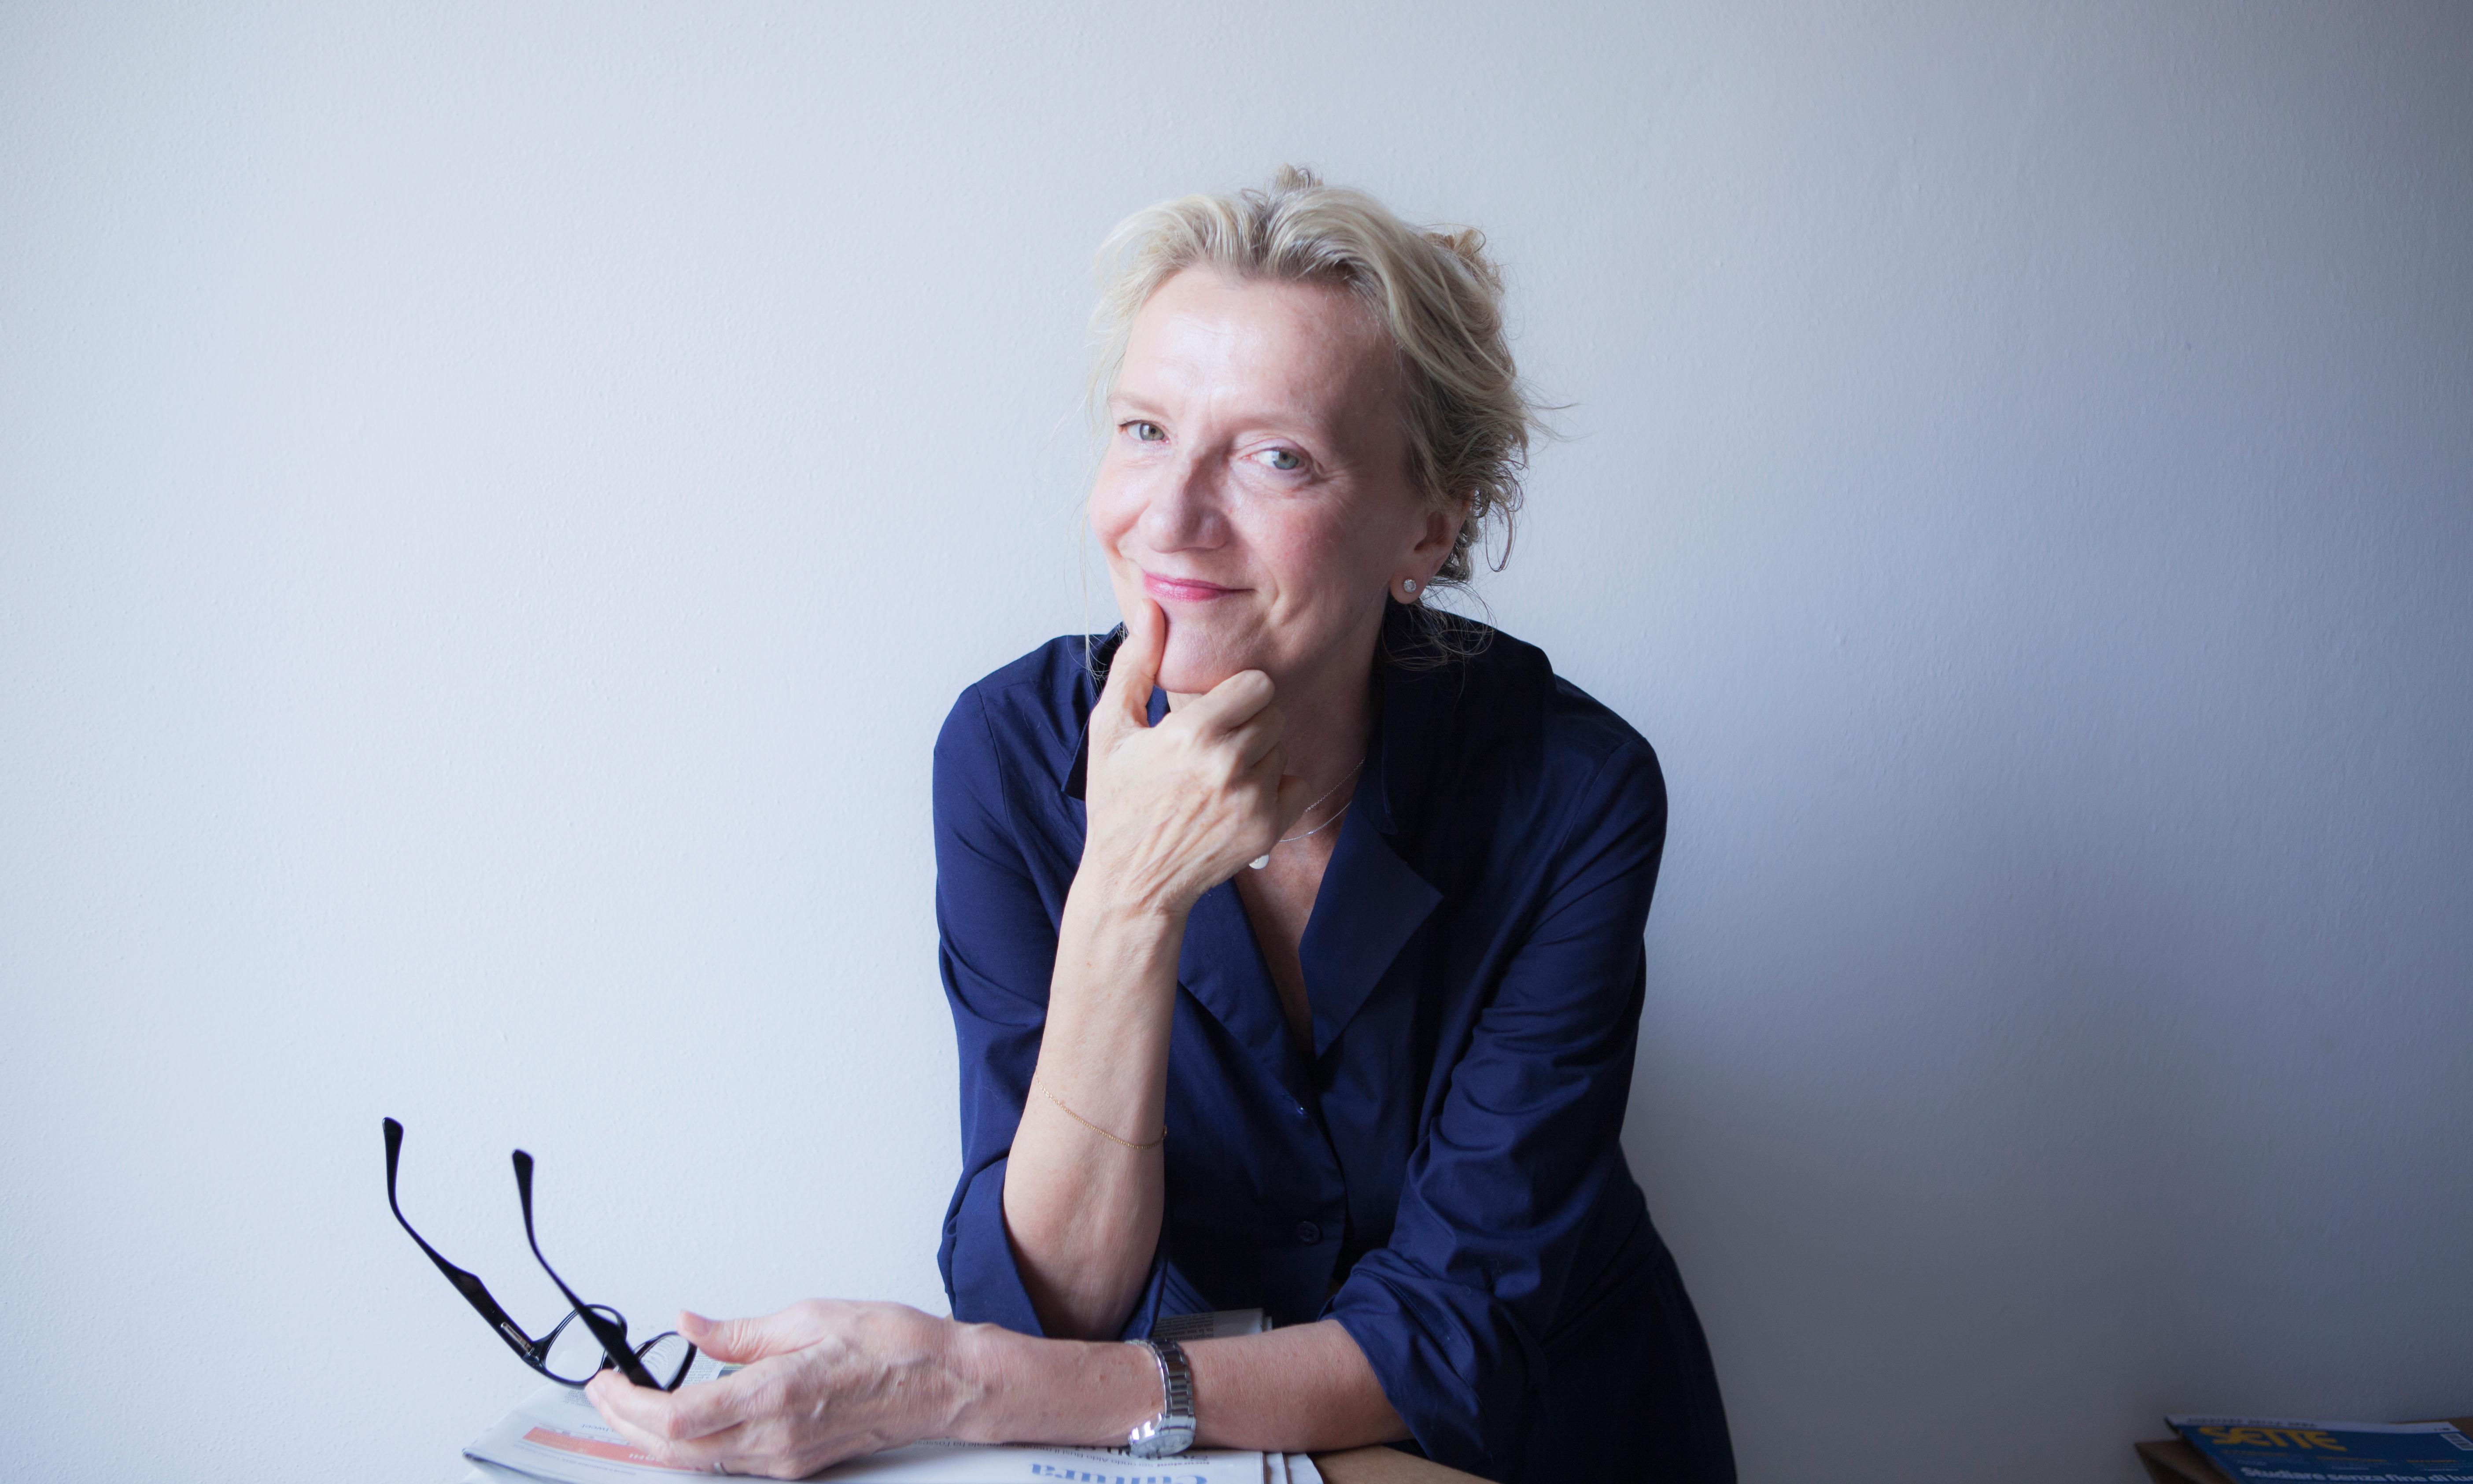 'Oh man, she's back': Elizabeth Strout on the return of Olive Kitteridge